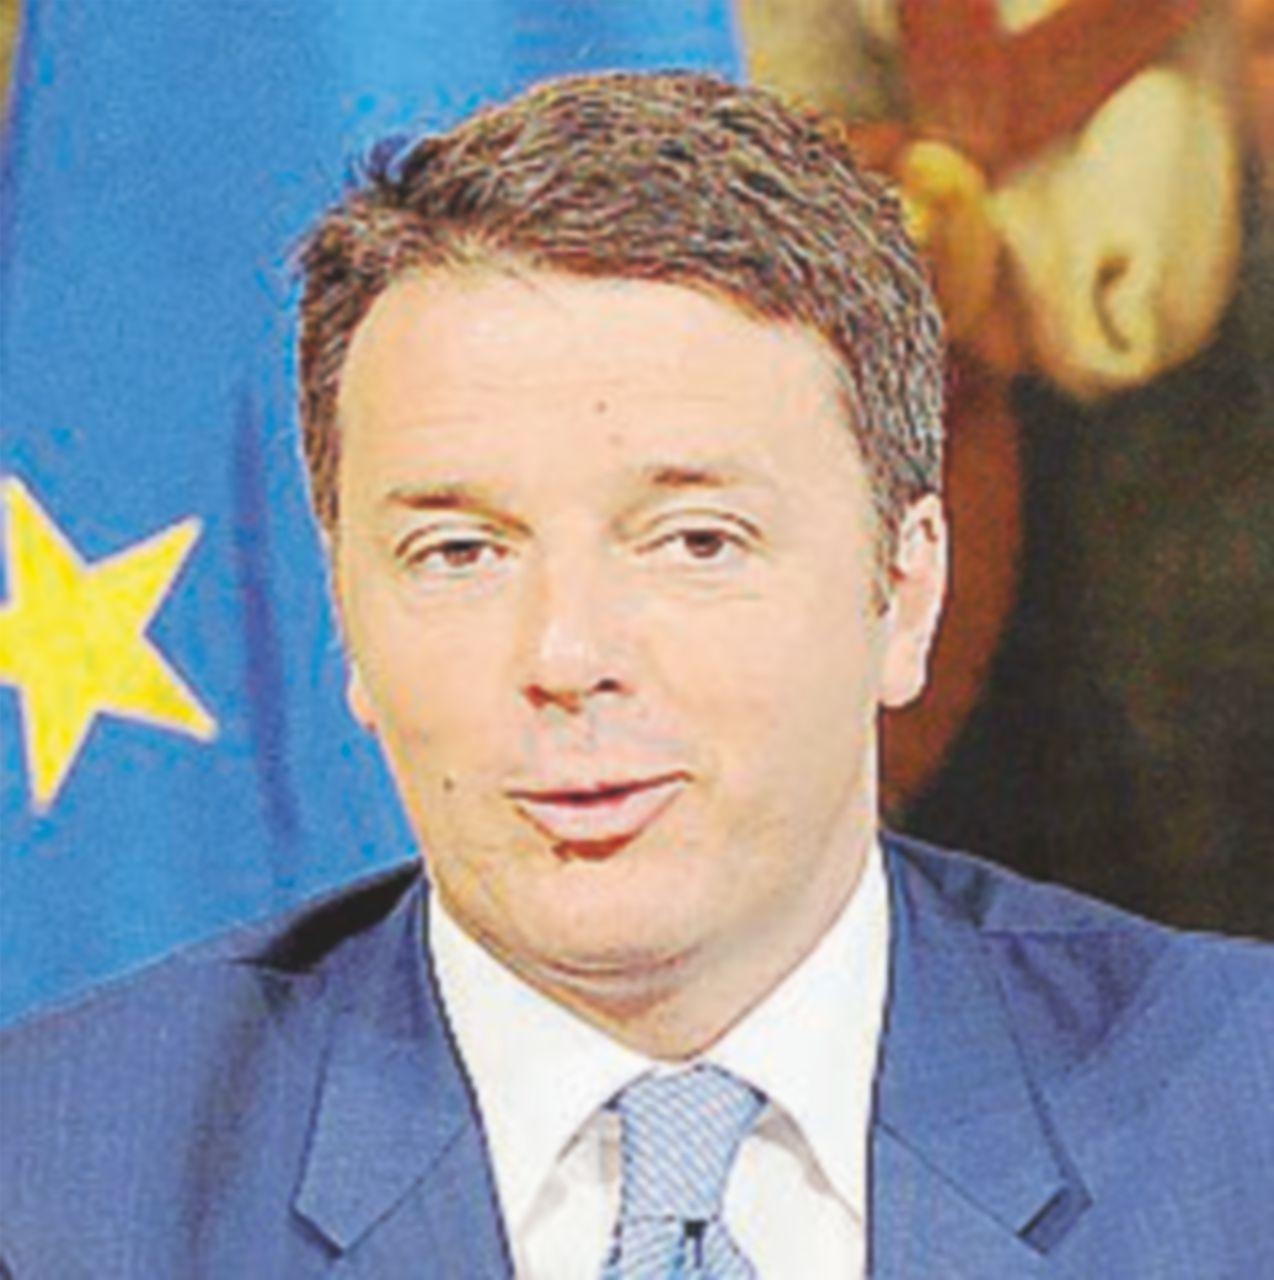 I meriti di sgravi e Jobs act: parola di Matteo Renzi